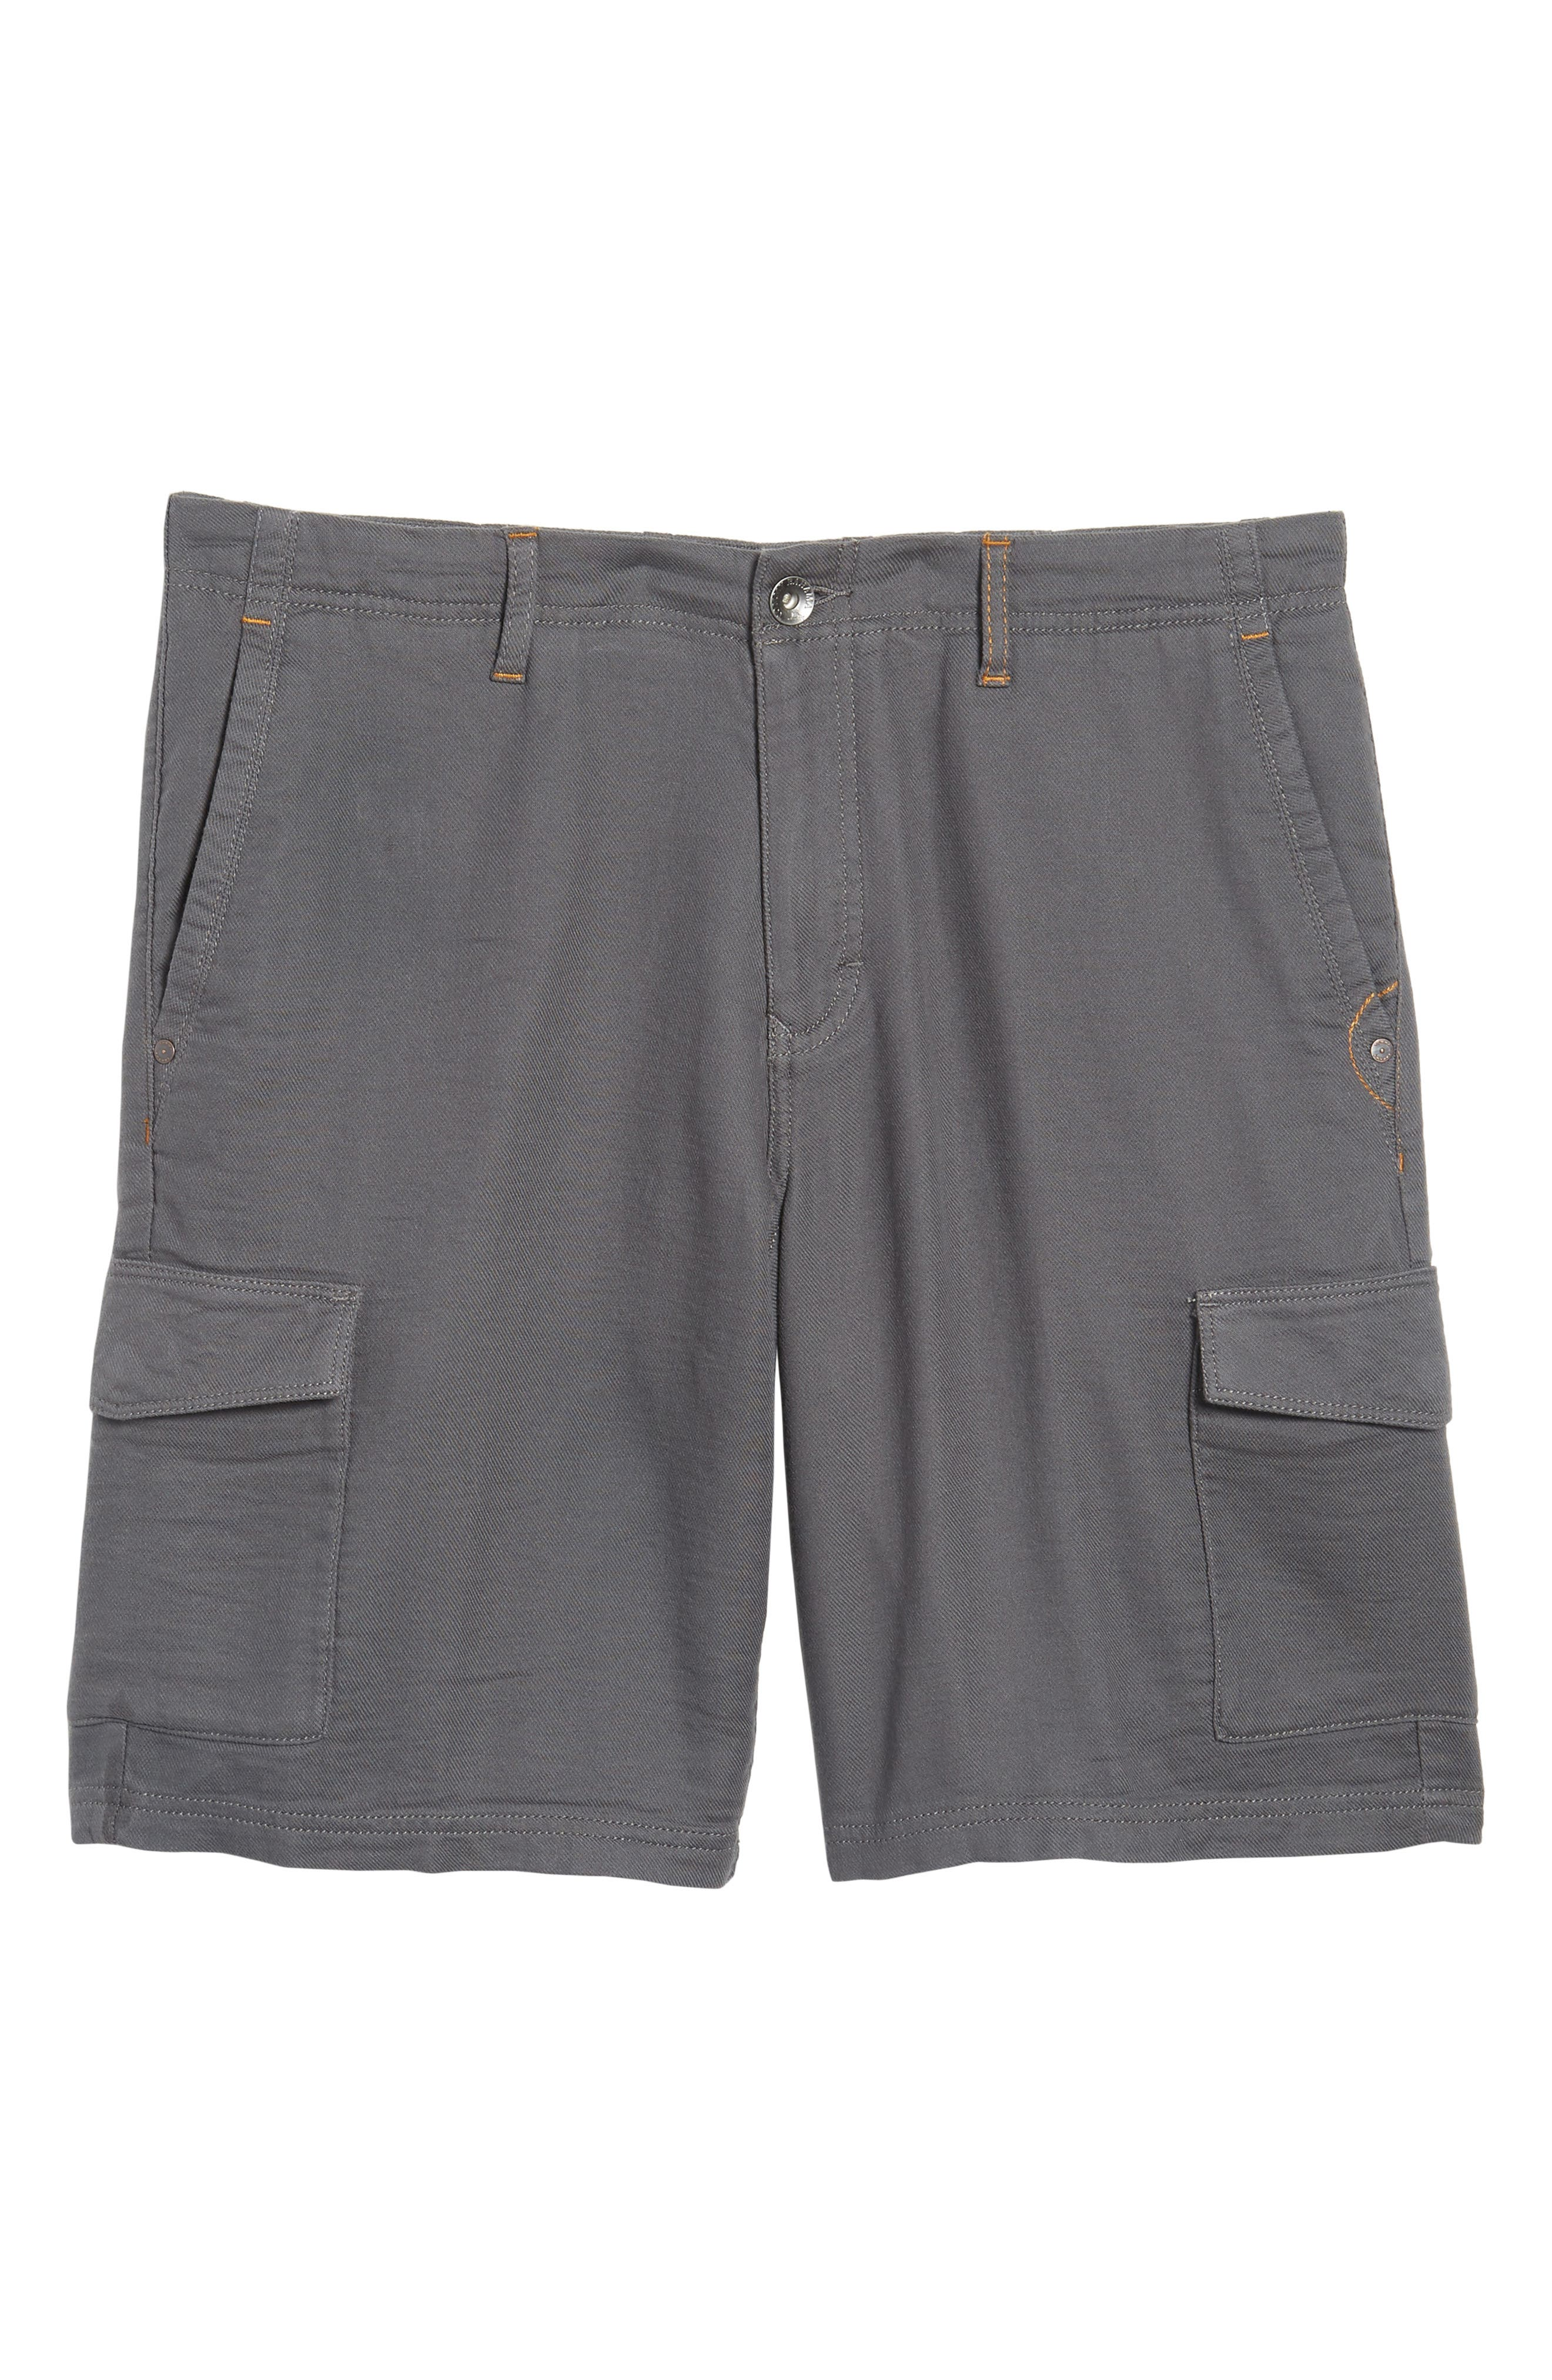 Edgewood Cargo Shorts,                             Alternate thumbnail 6, color,                             050